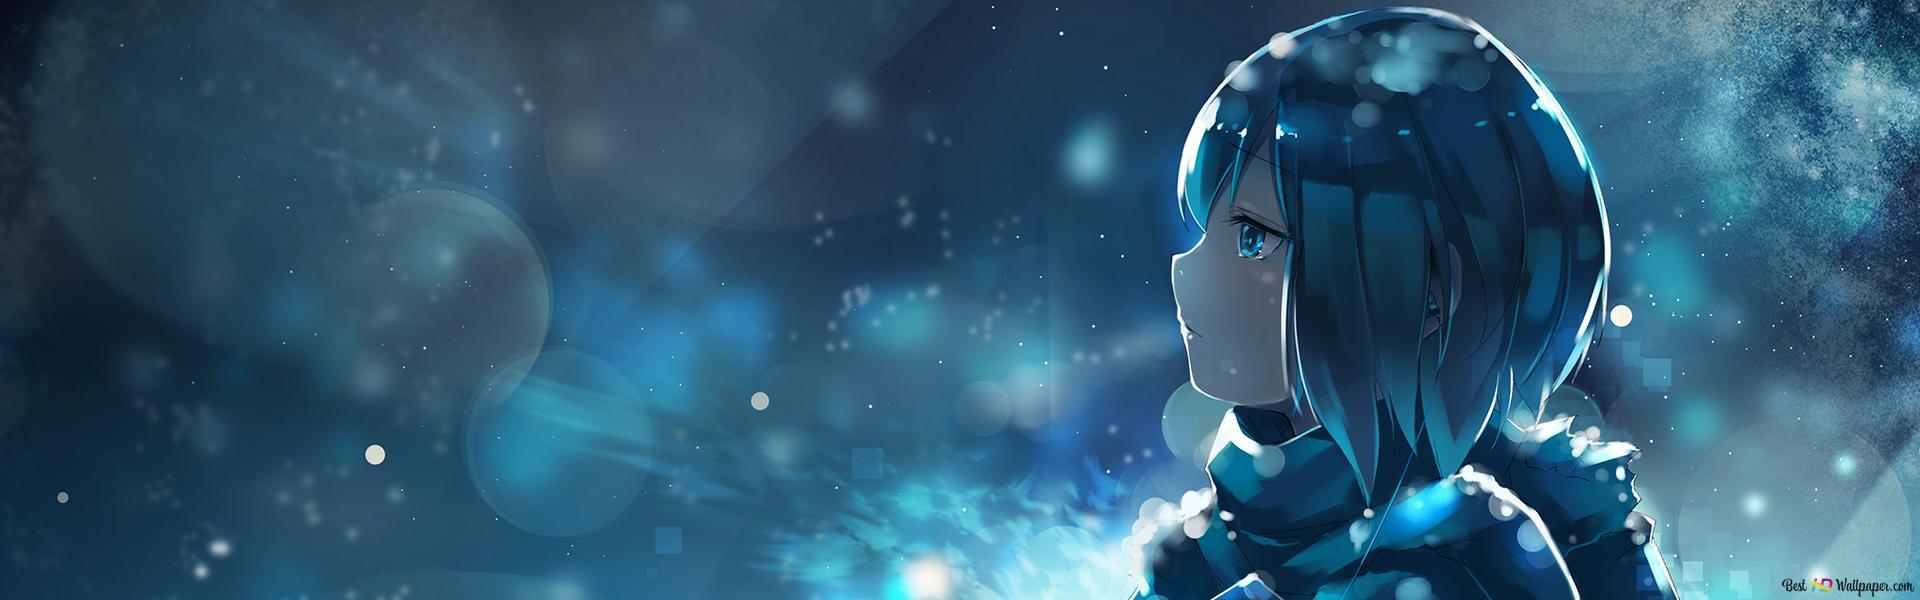 anime girl background HD wallpaper